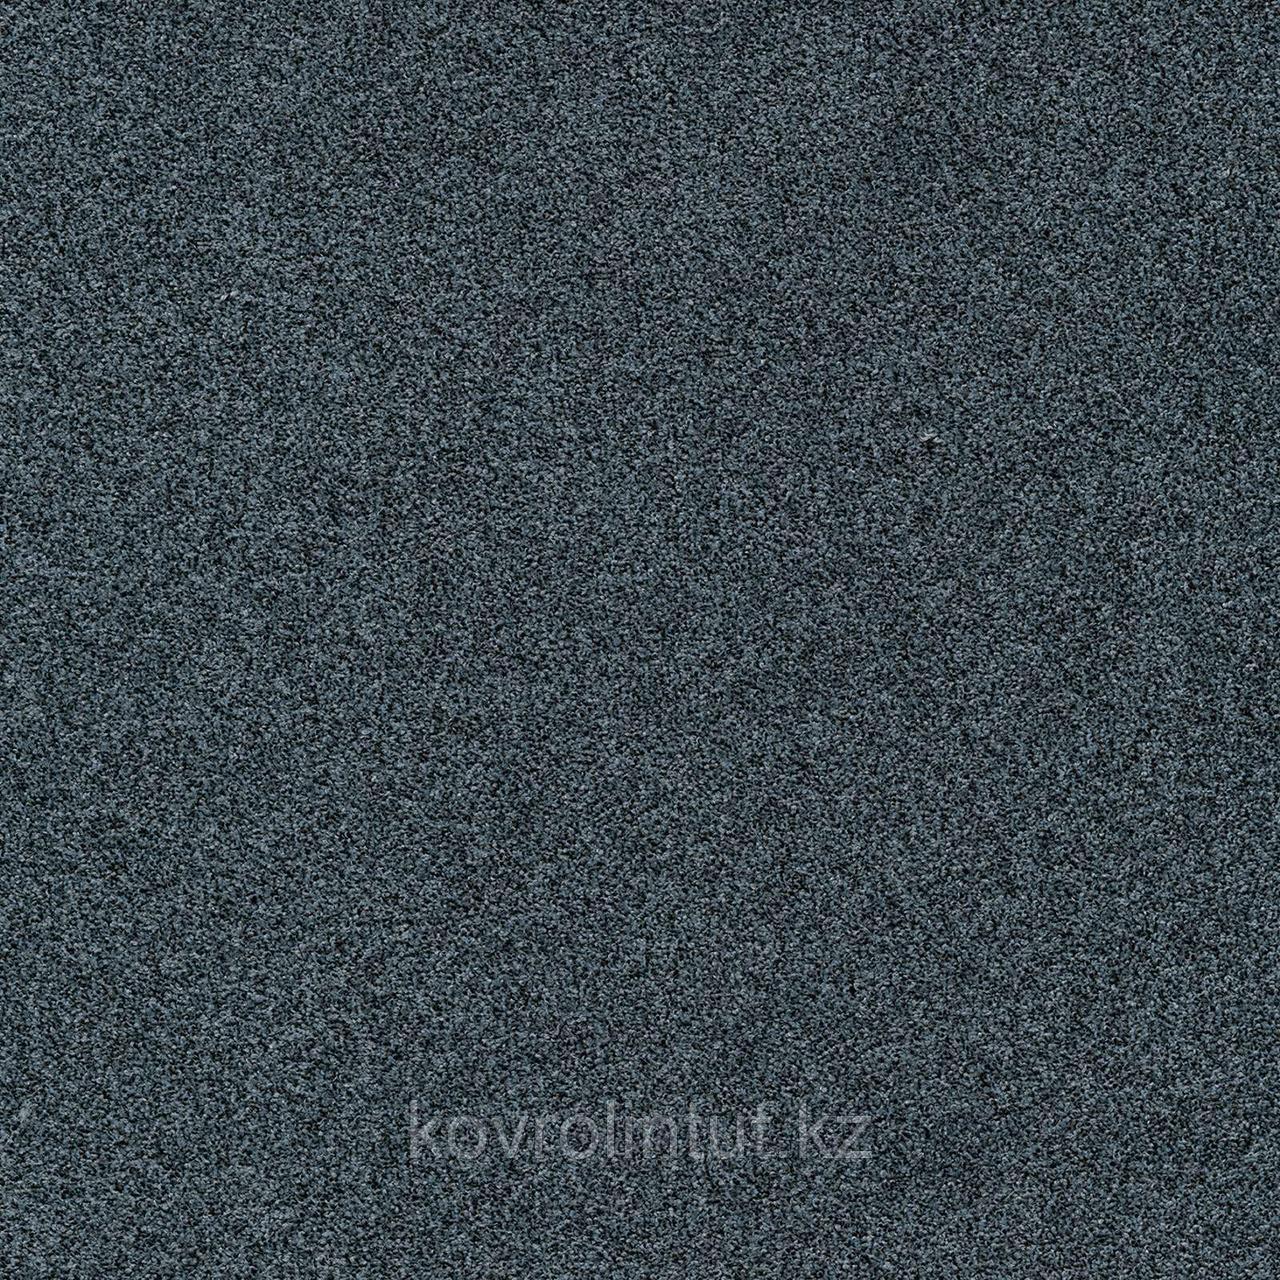 Плитка ковровая Modulyss, Gleam 579, 50х50